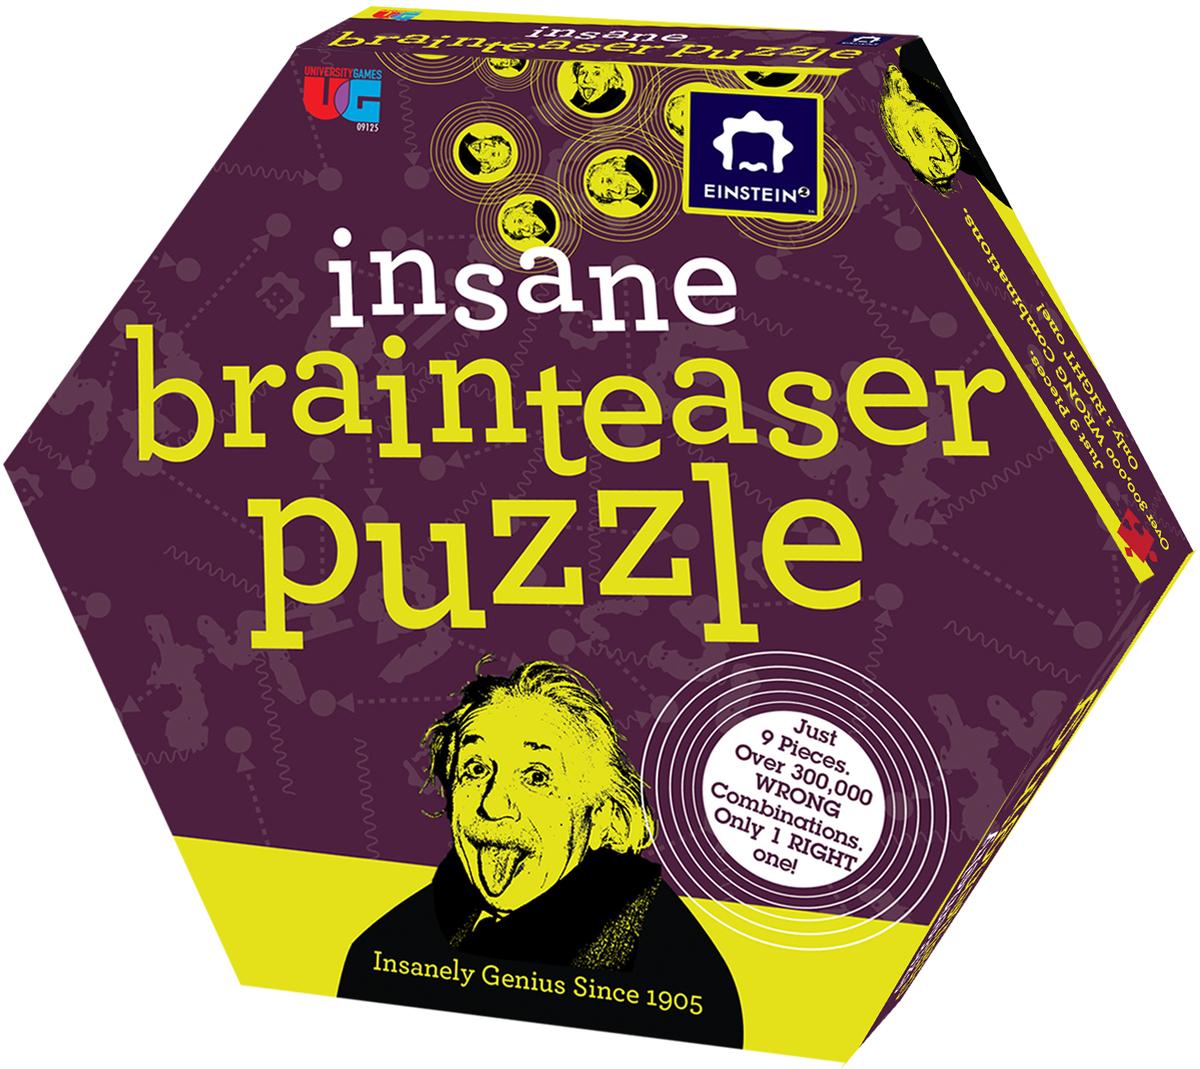 Insane Brainteaser Puzzle